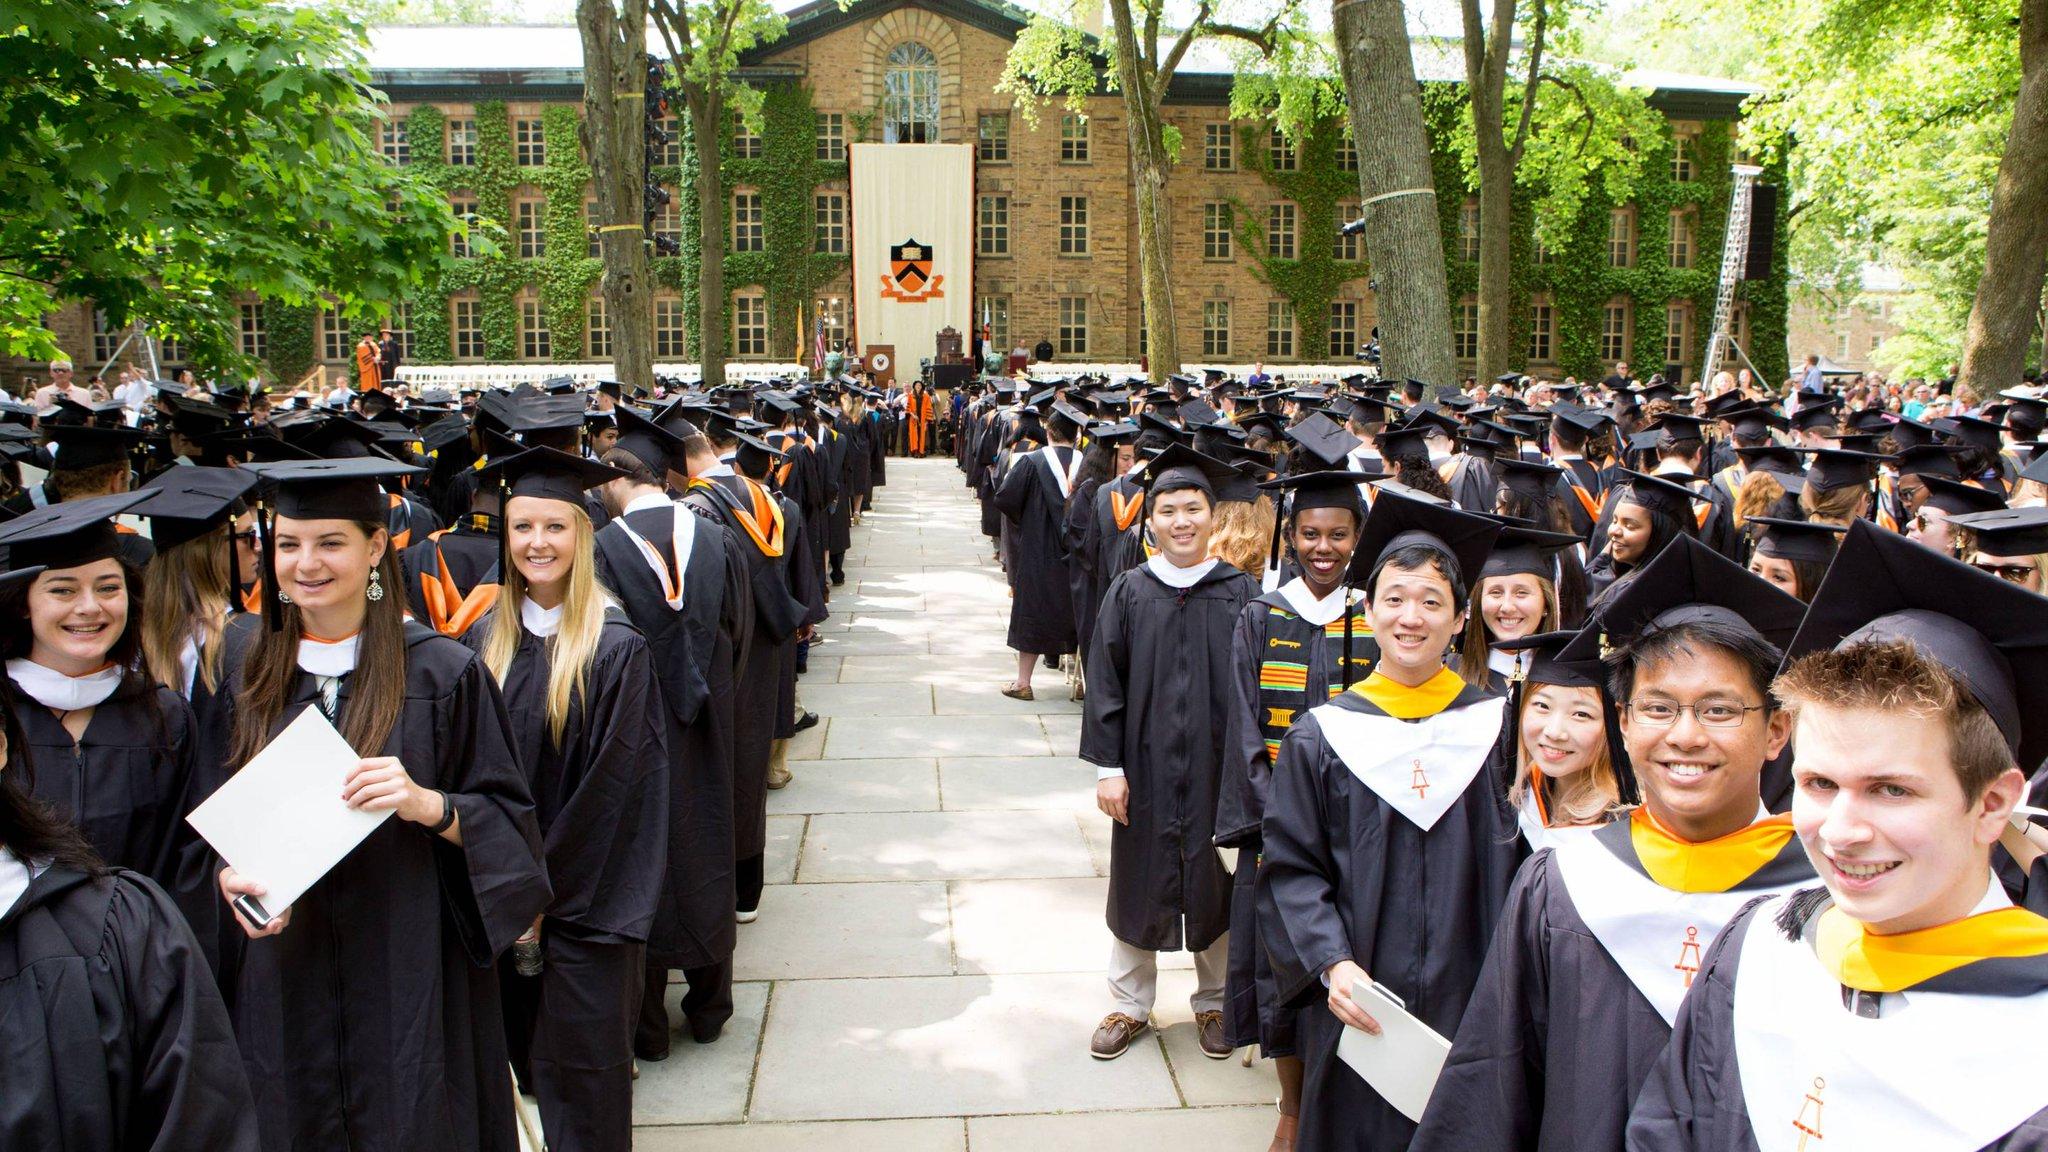 Thumbnail for #Princeton17